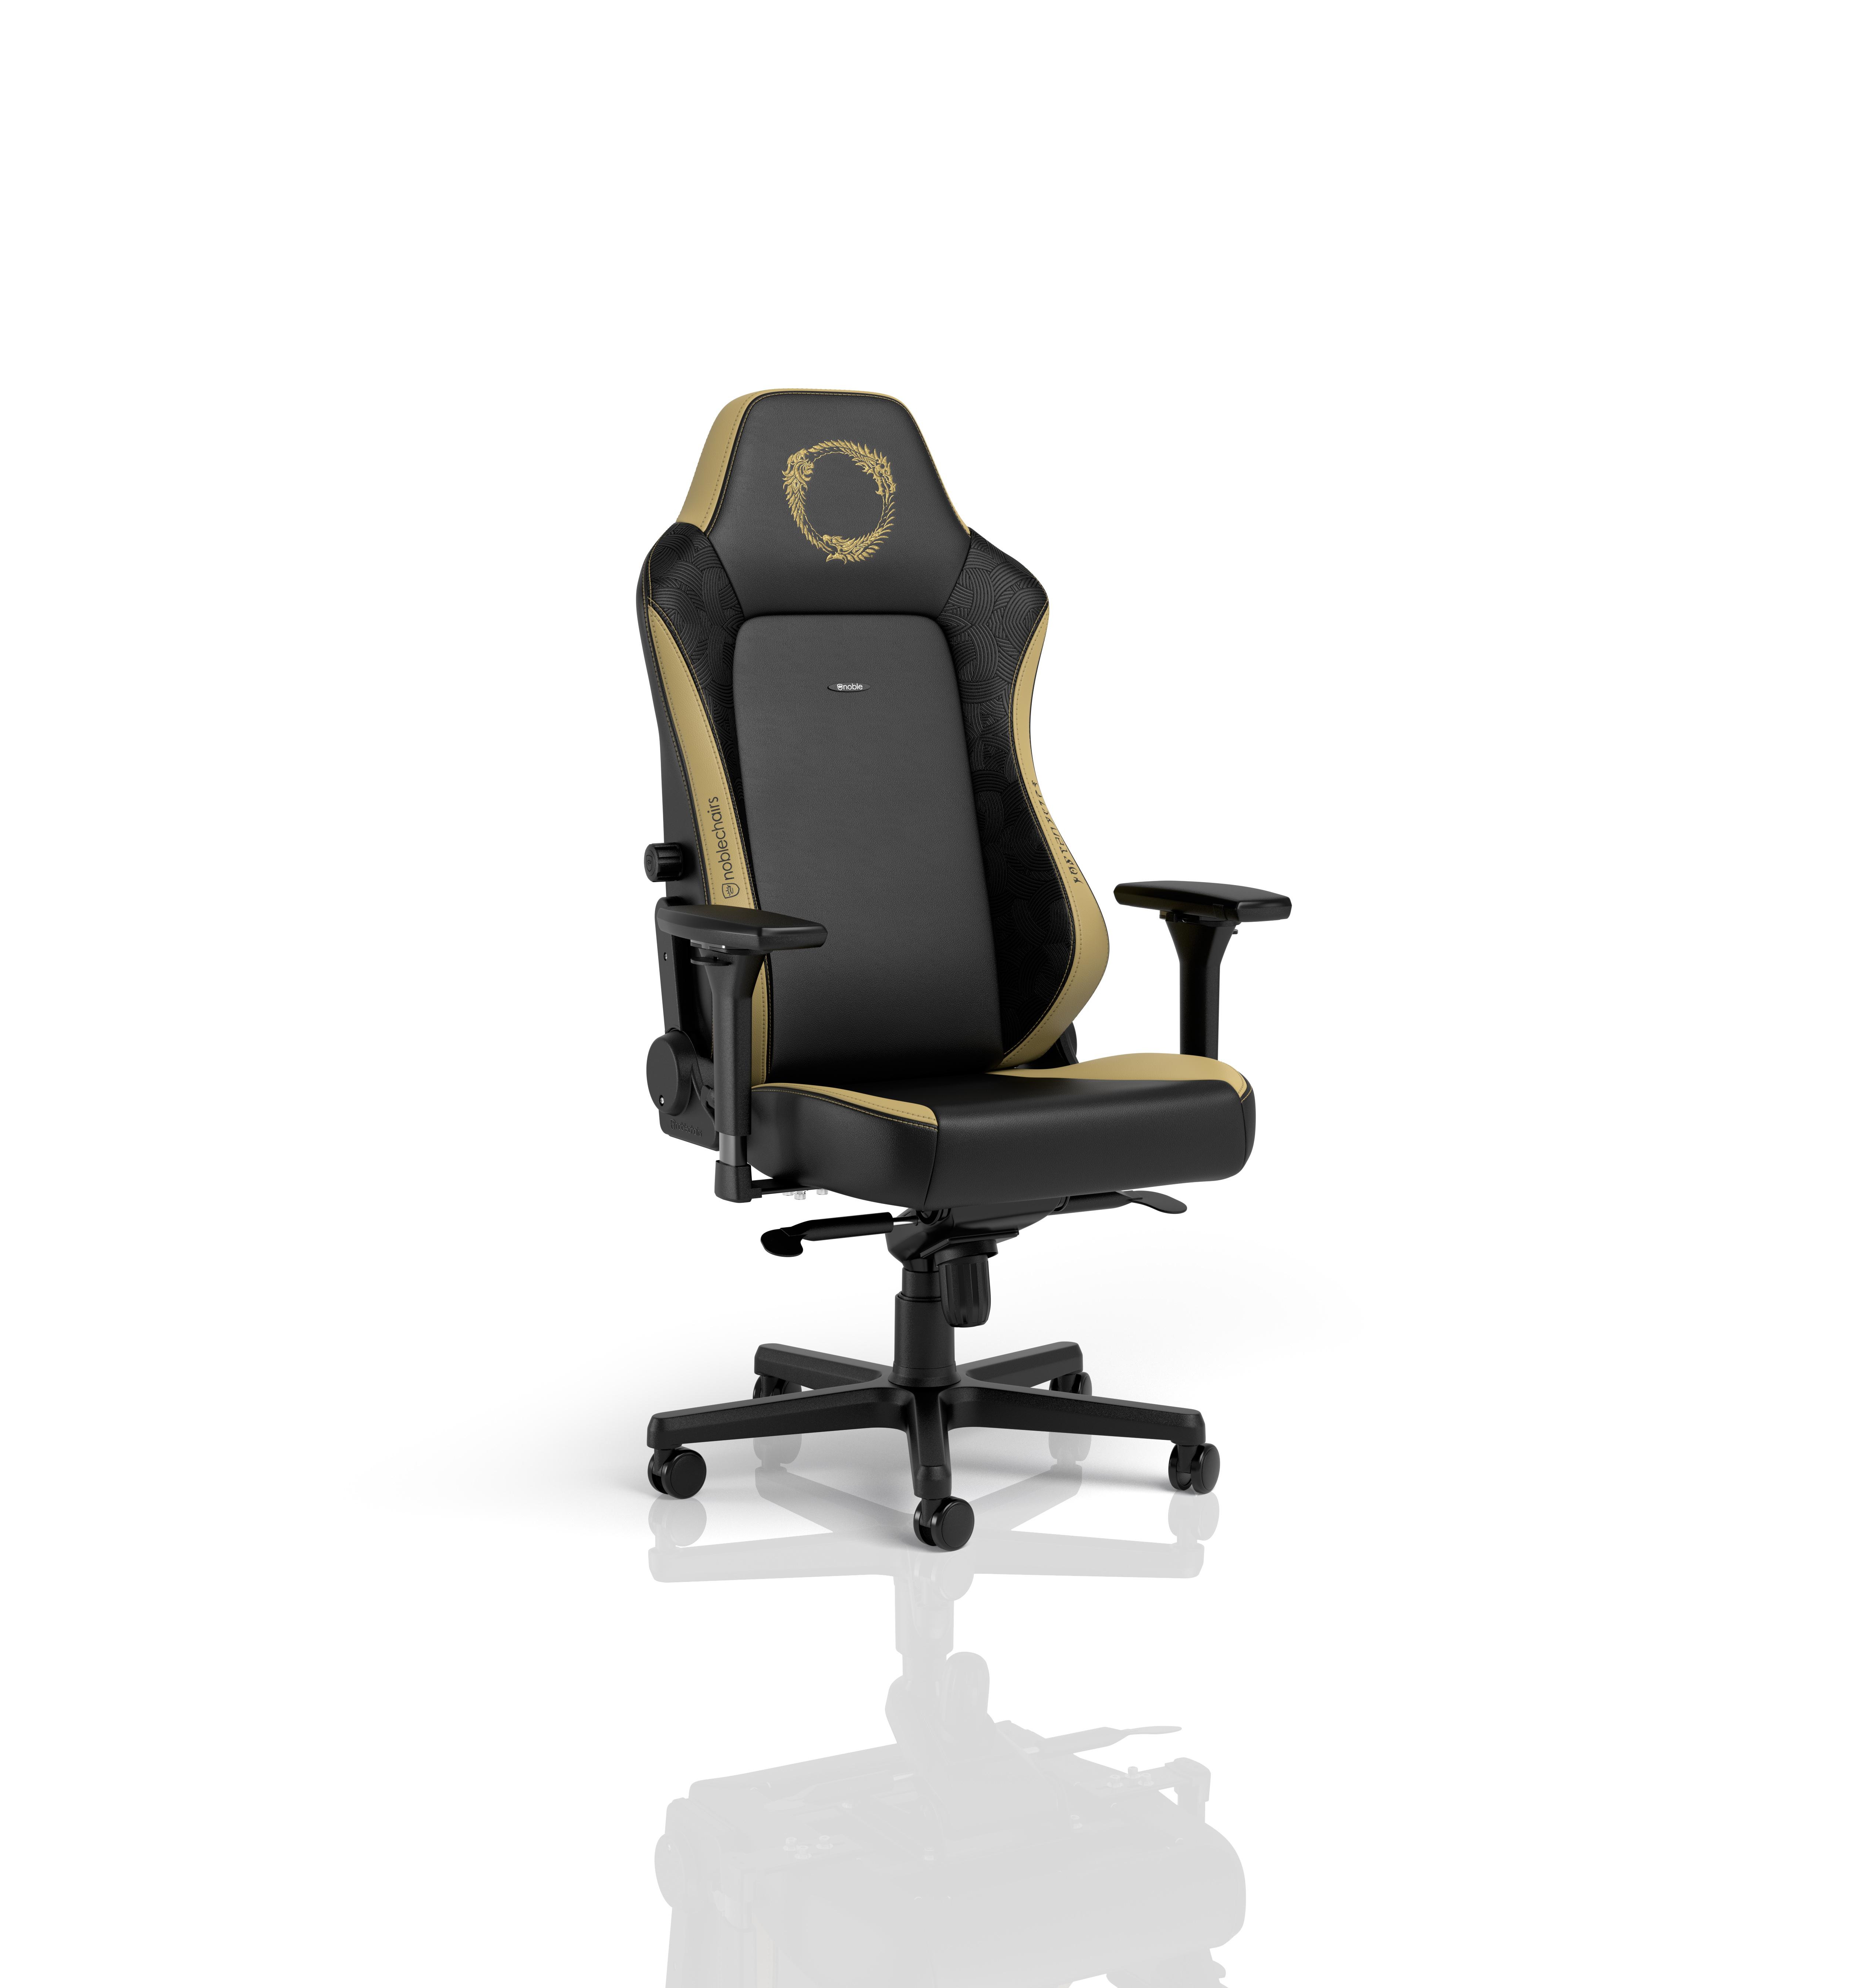 Gamer szék noblechairs HERO The Elder Scrolls Online Special Edition PU Bőr (NBL-HRO-PU-ESO )